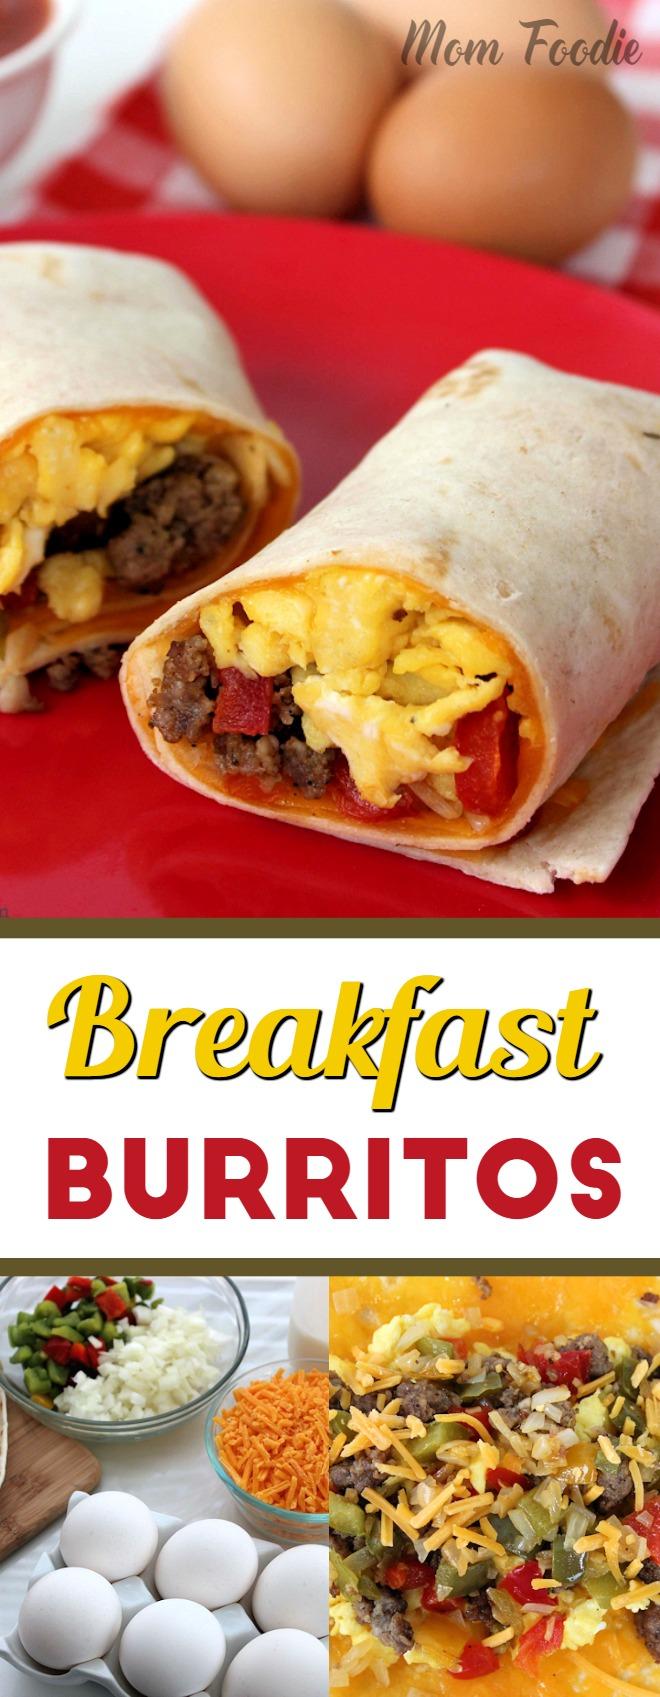 Breakfast Burritos - easy breakfast recipe